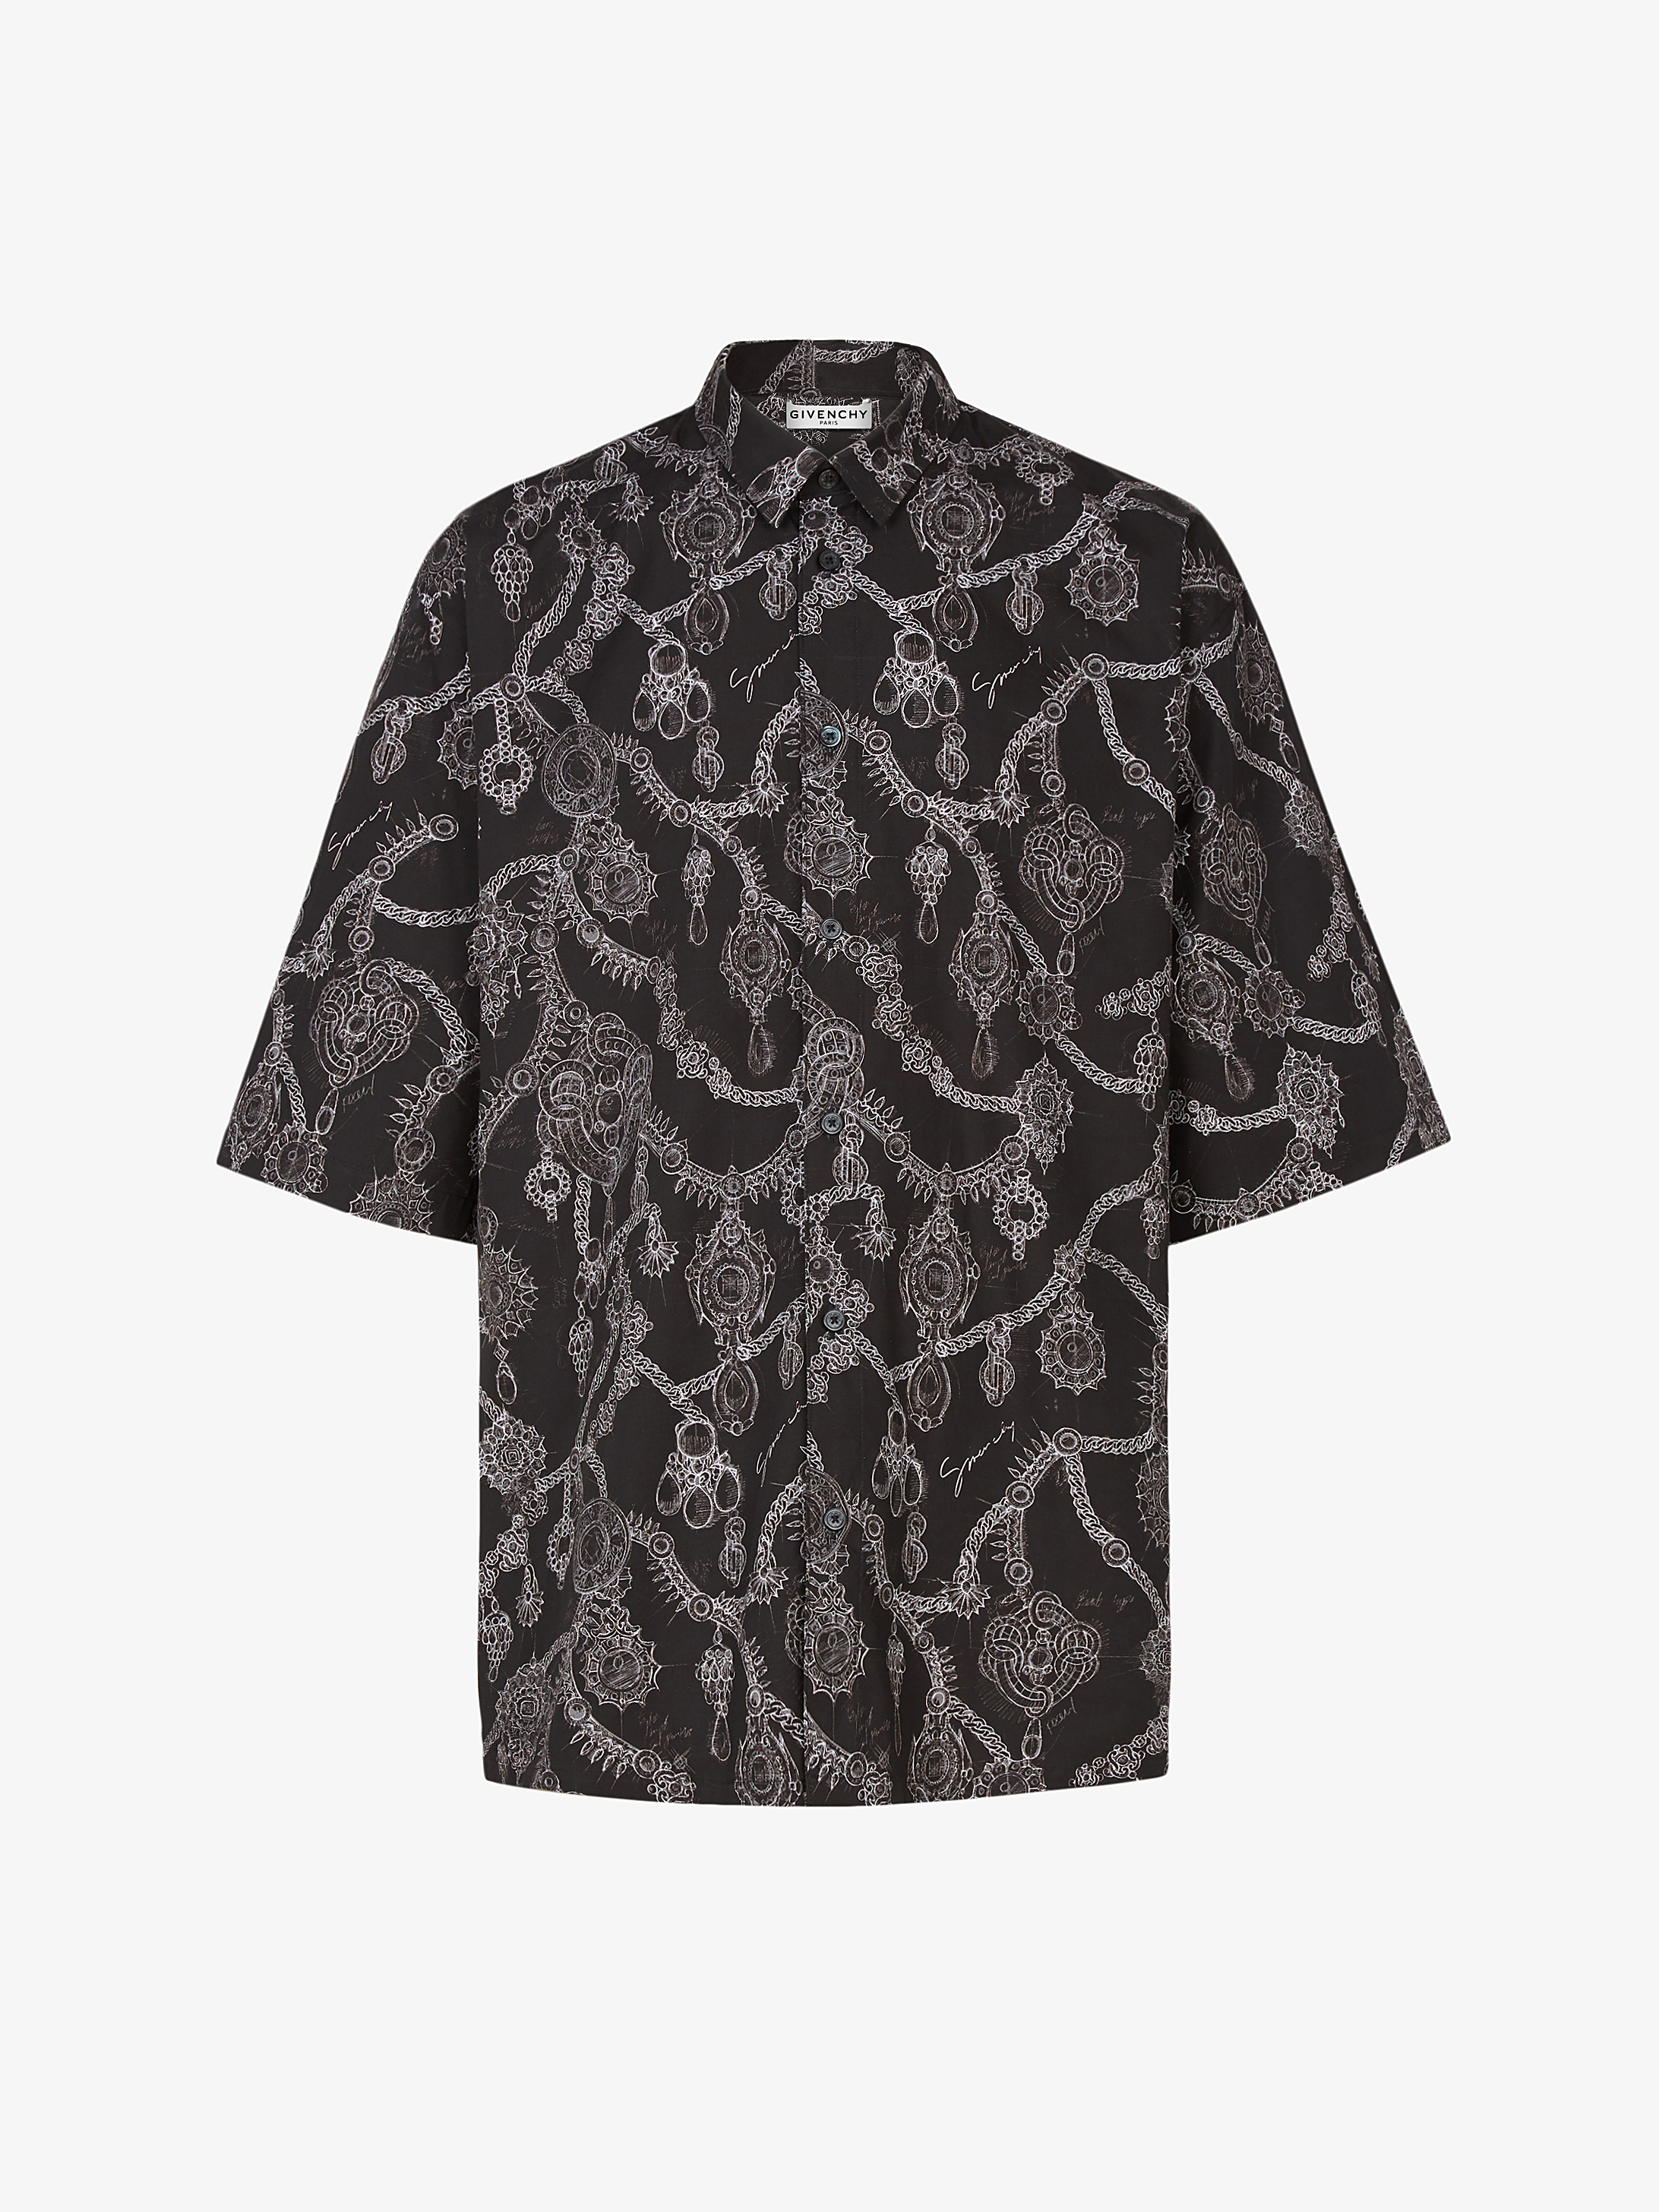 Studio Homme 주얼리 프린트 셔츠